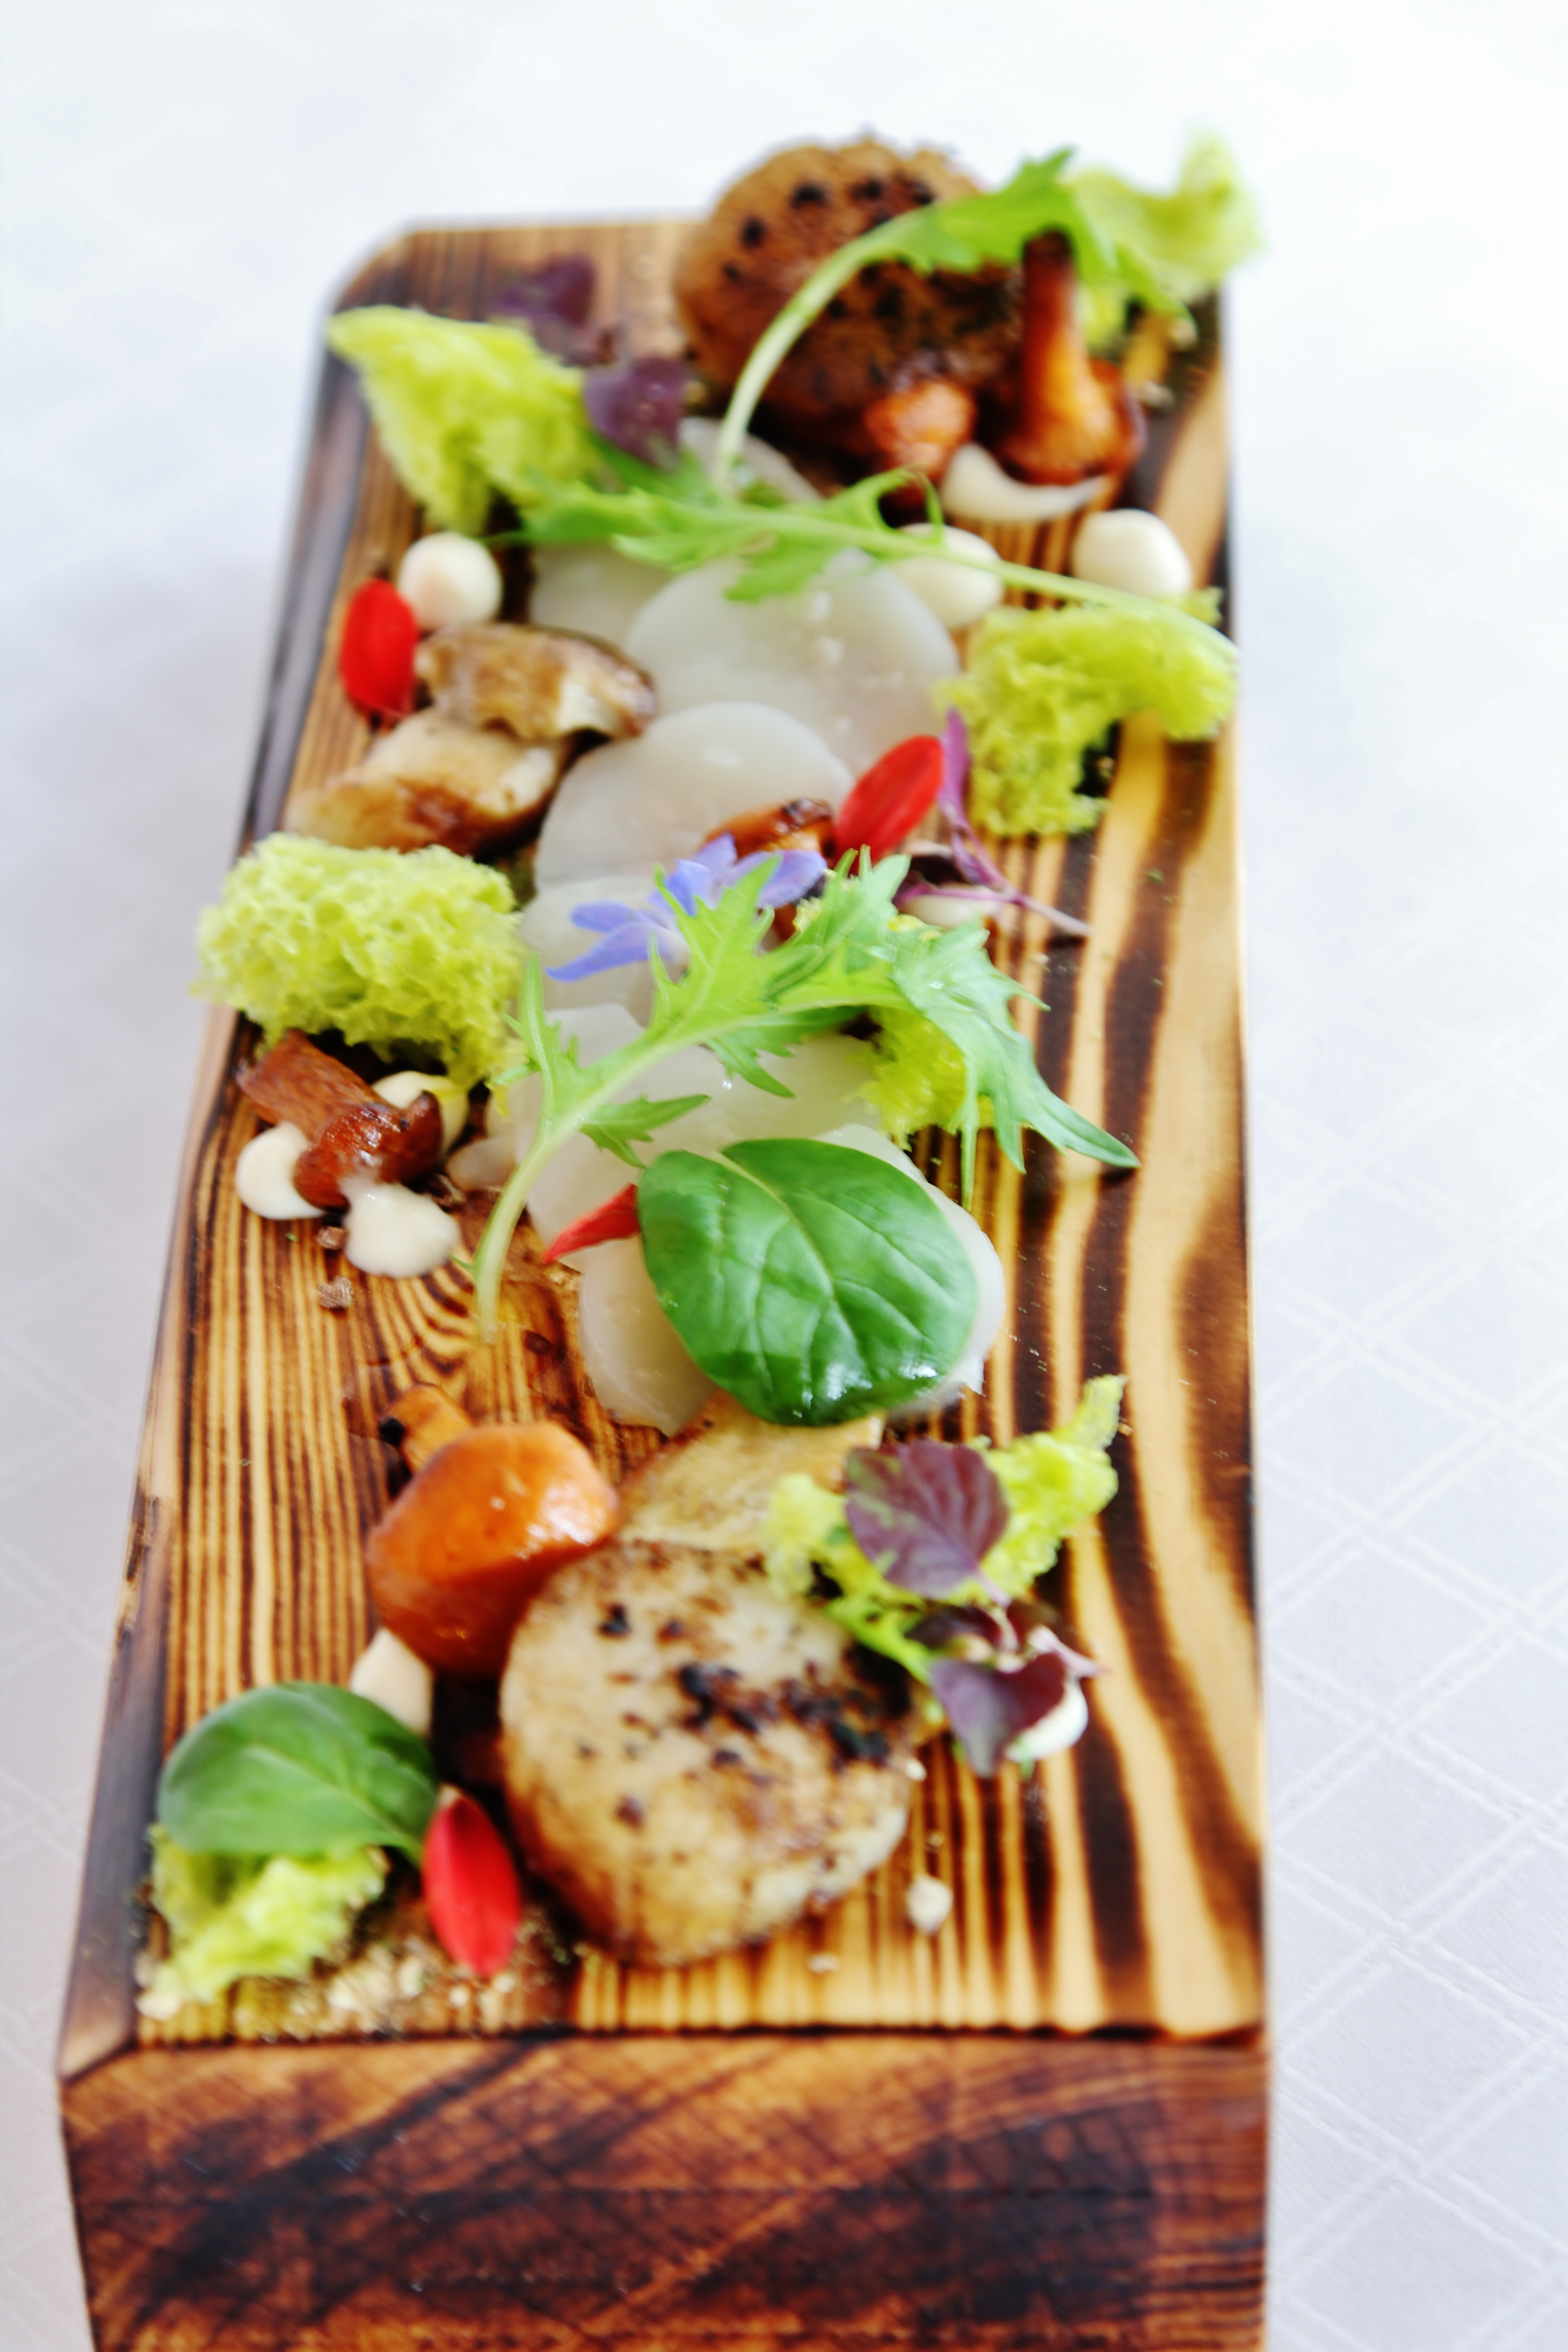 Bellevue Rheinhotel_Gourmetrestaurant_Jakobsmuschel und Pilze